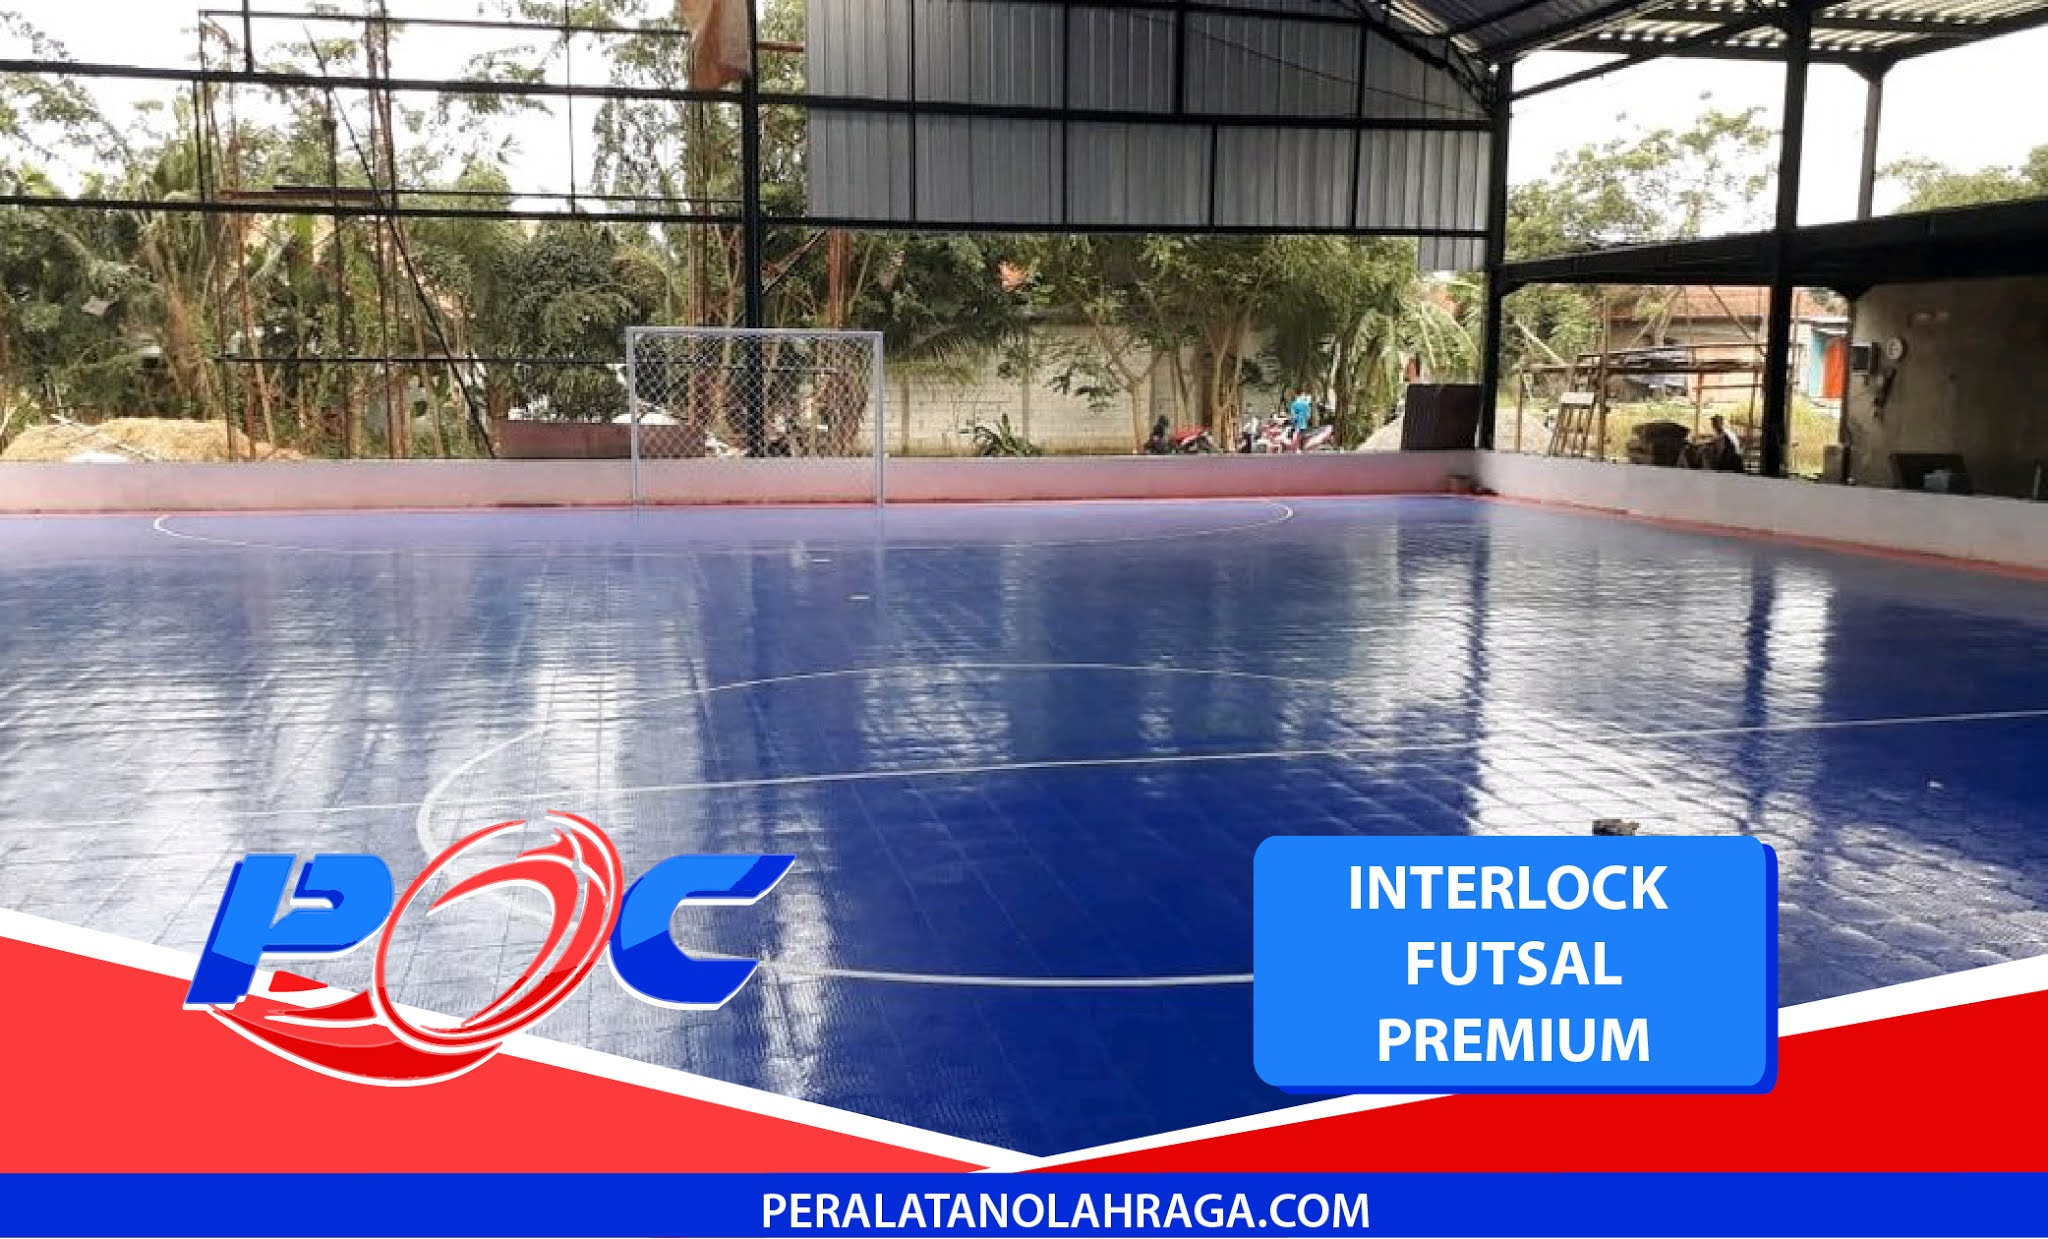 Interlock Futsal premium